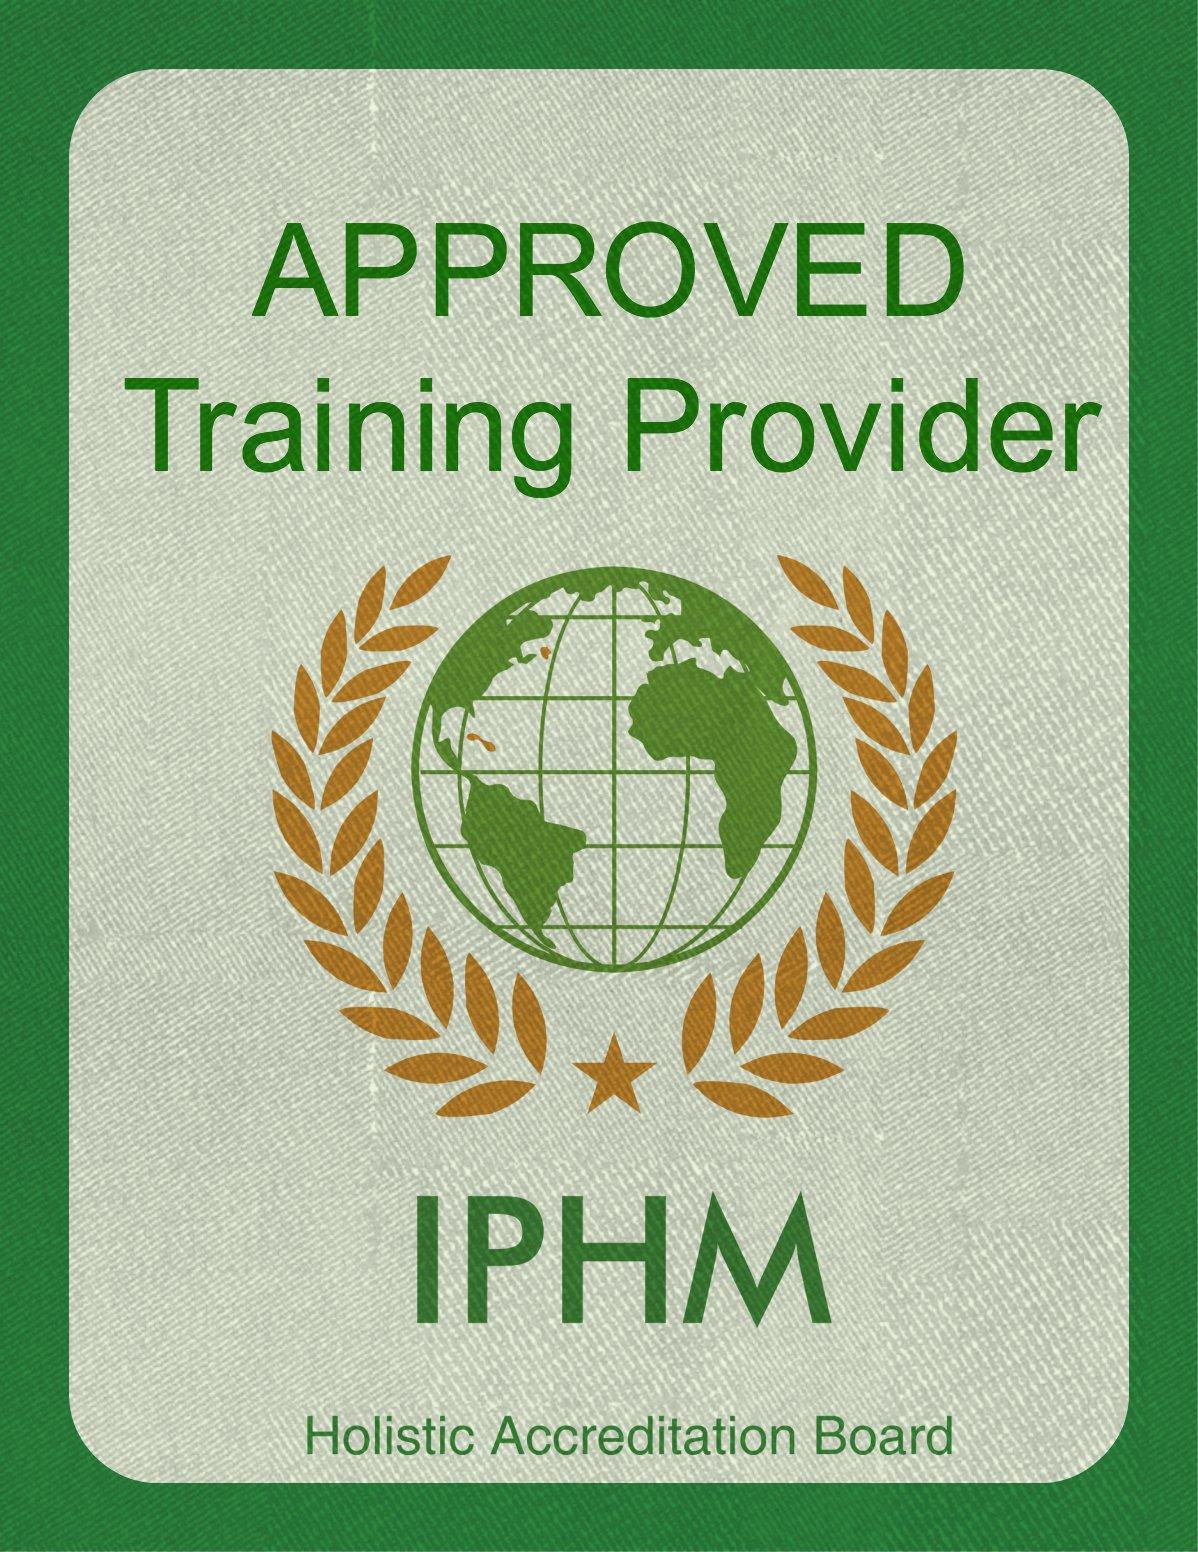 Training Logo IPHM.jpgTraining Logo IPHM.jpg-jessica-vilches-yoga-teacher-training-bali-ubud-india-goa-retreat-shamanism-breathwork